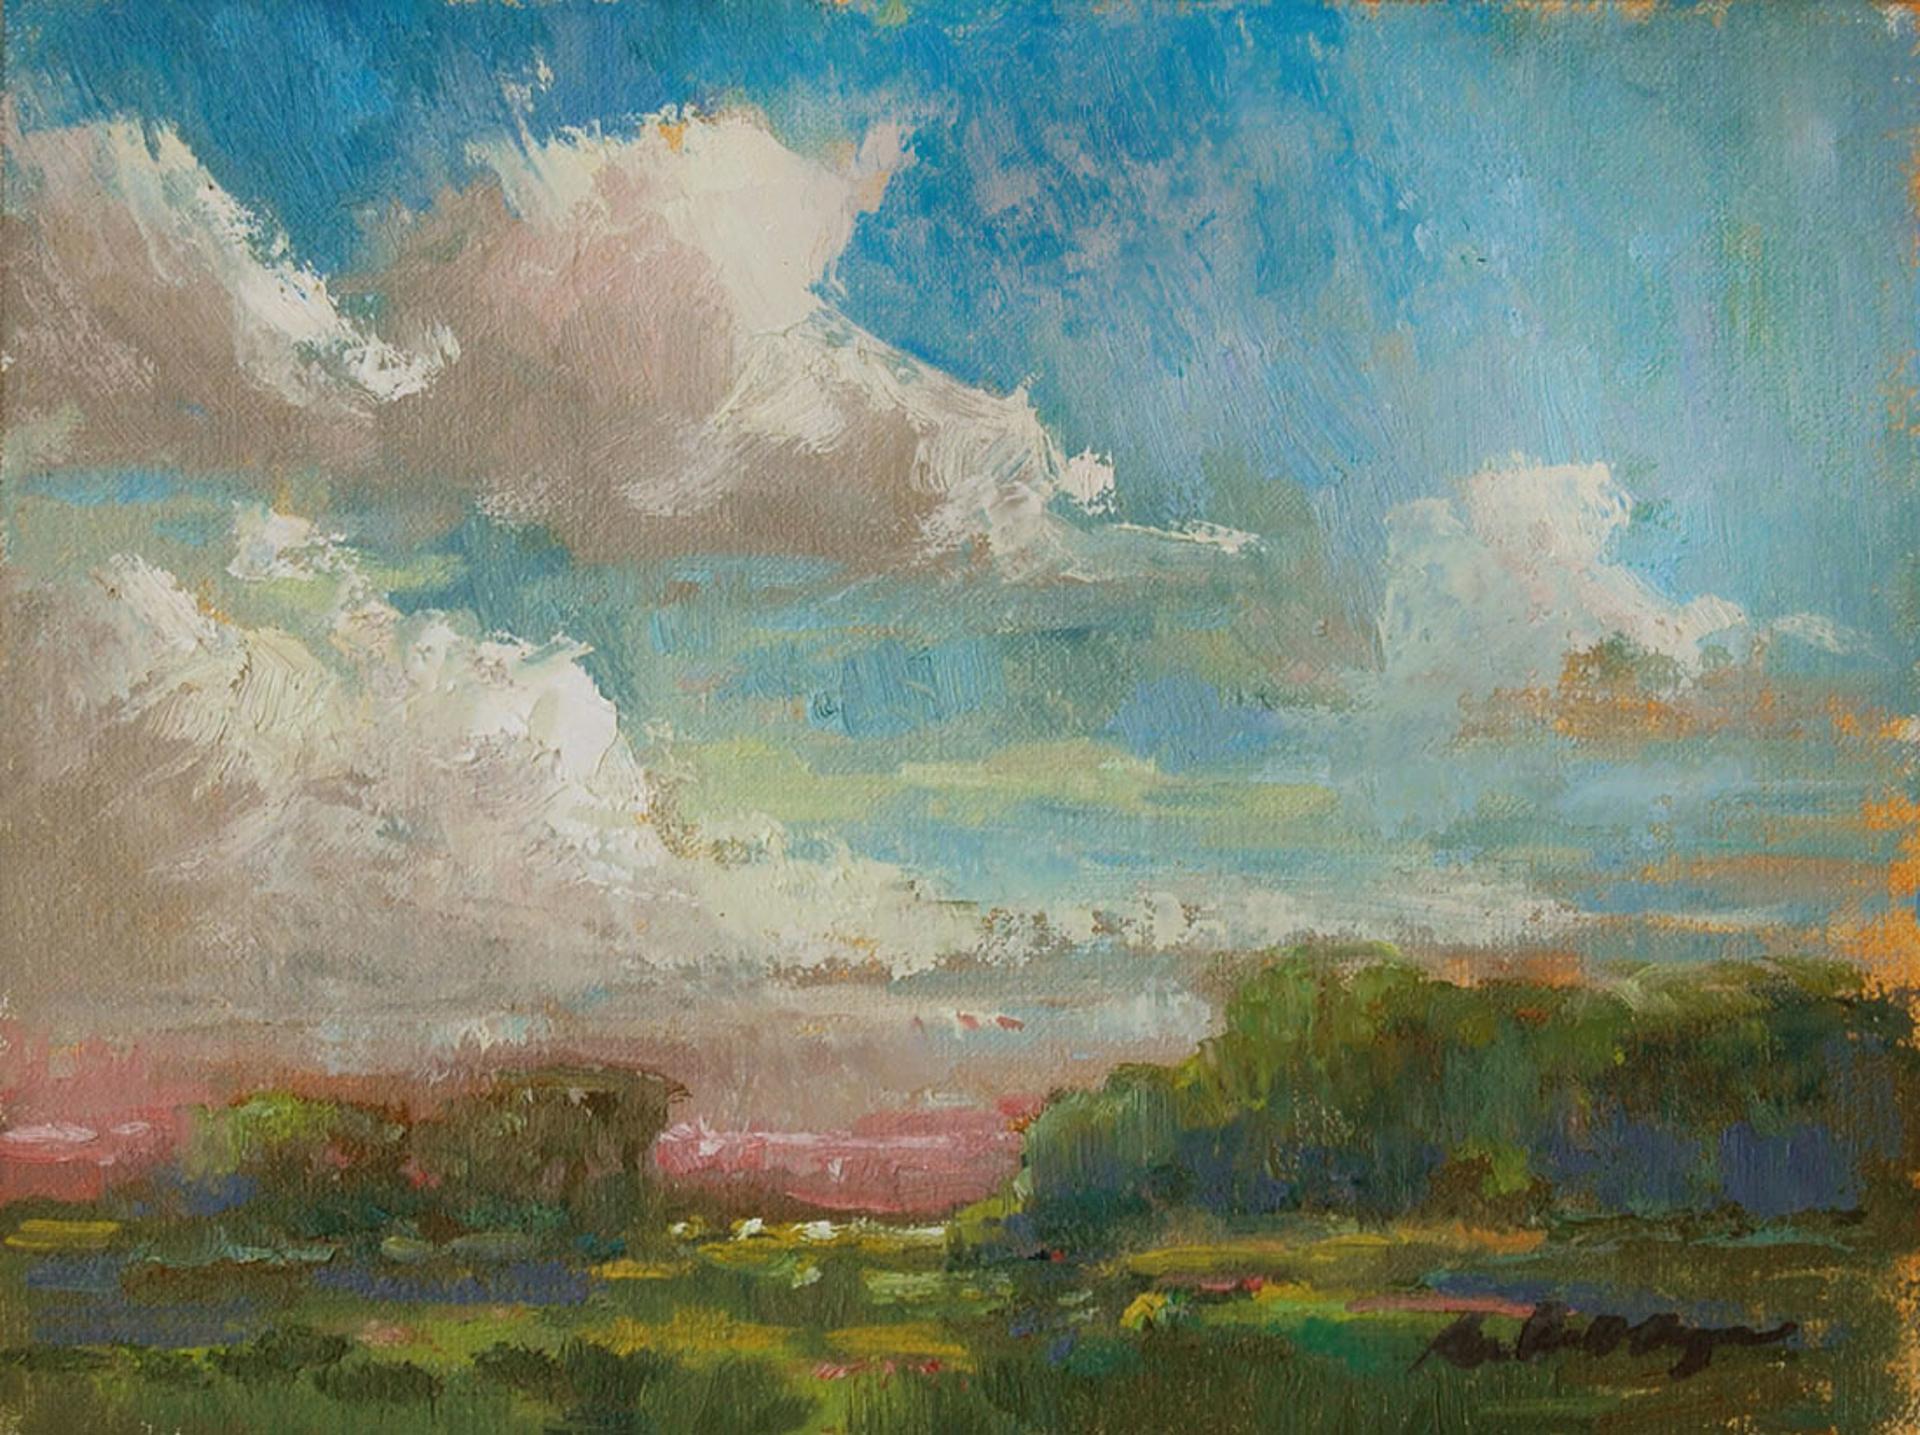 A Break In the Clouds by Karen Hewitt Hagan